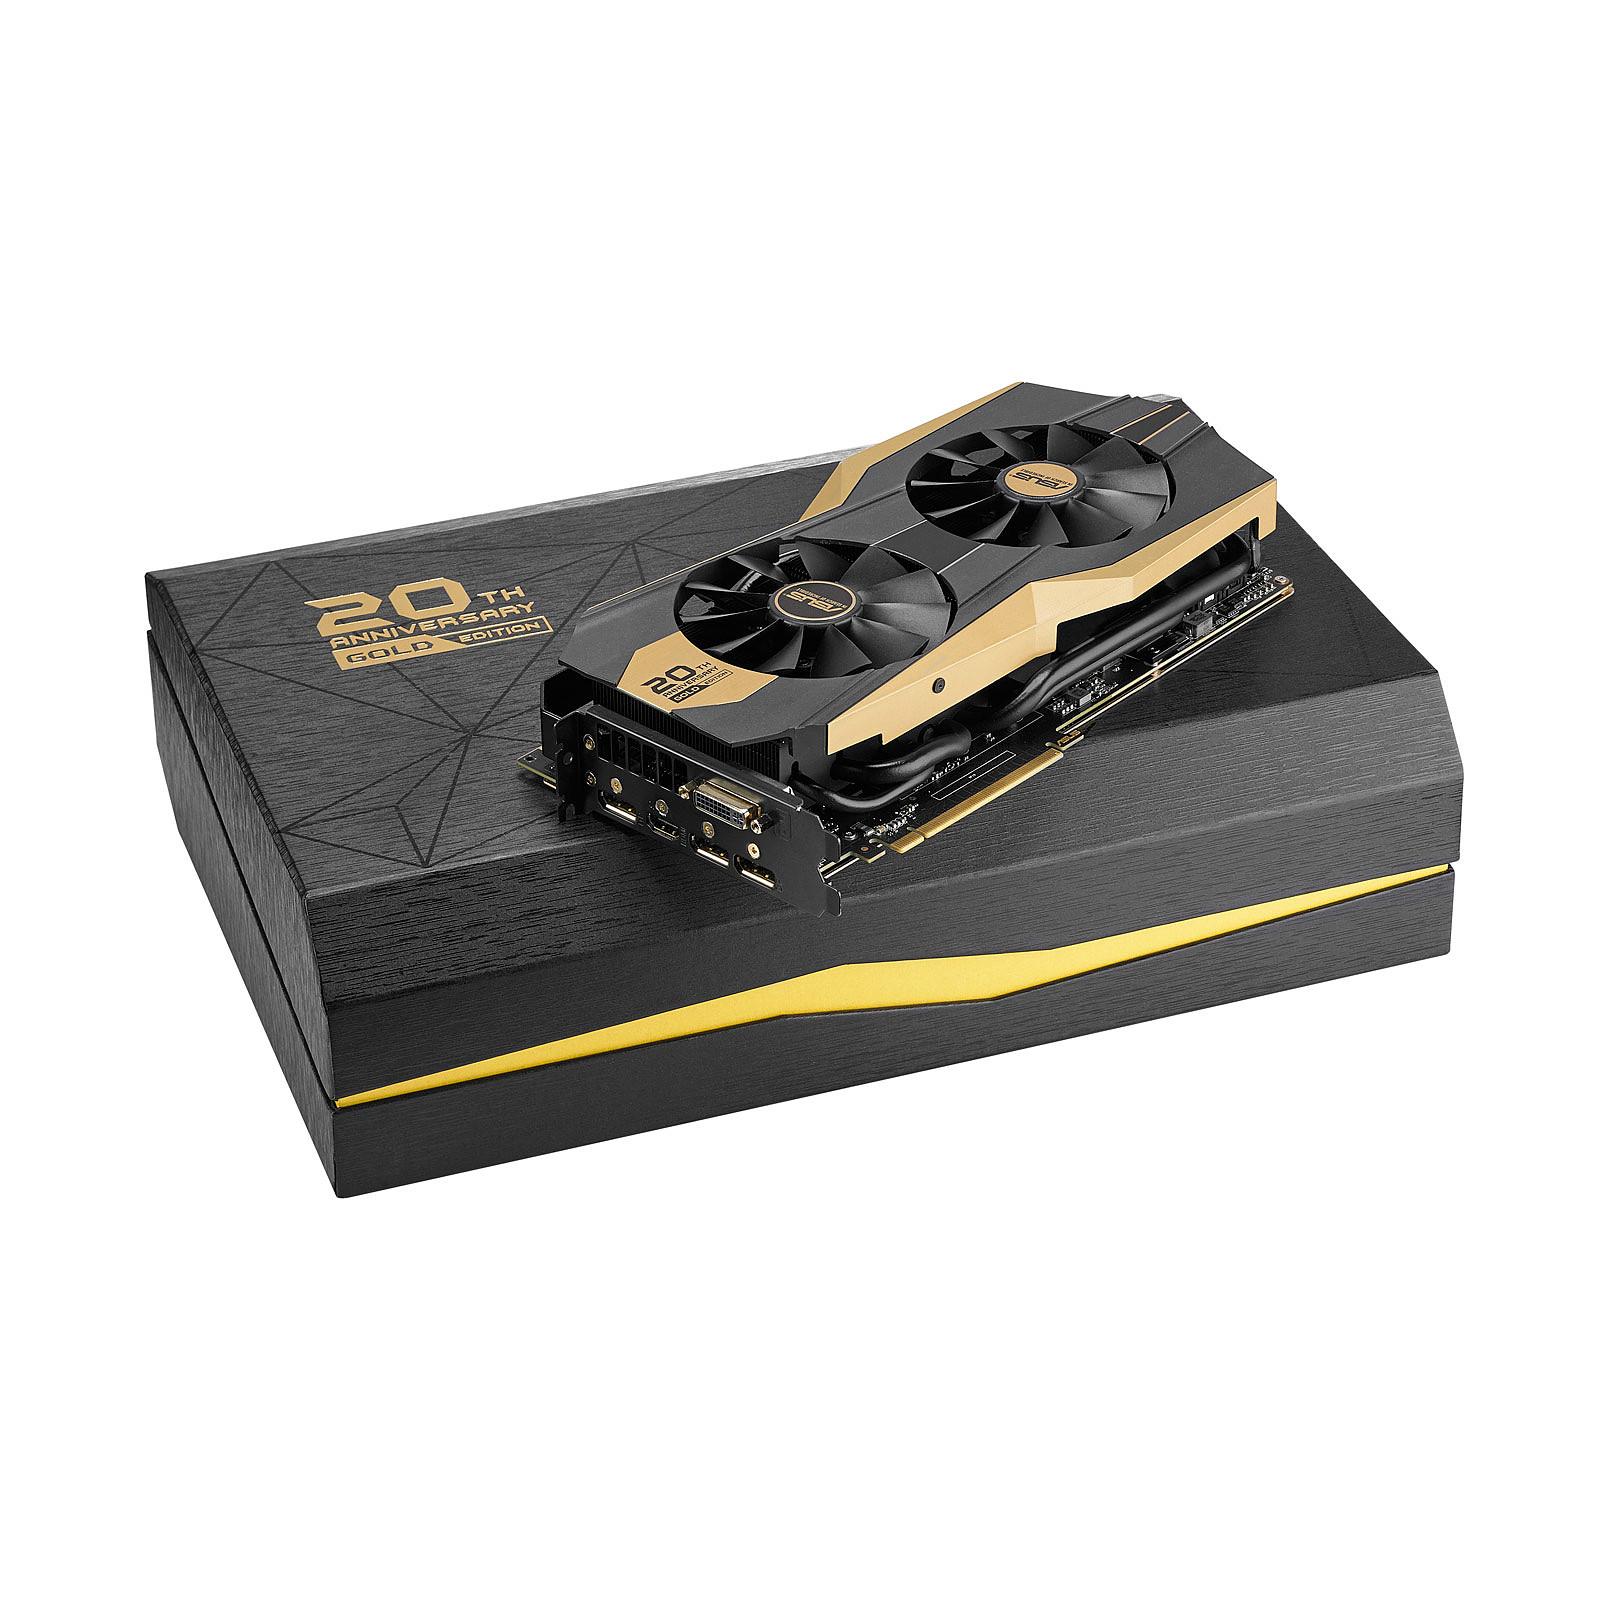 ASUS GOLD20TH-GTX980TI-P-6G-GAMING - GTX 980 Ti 6GB